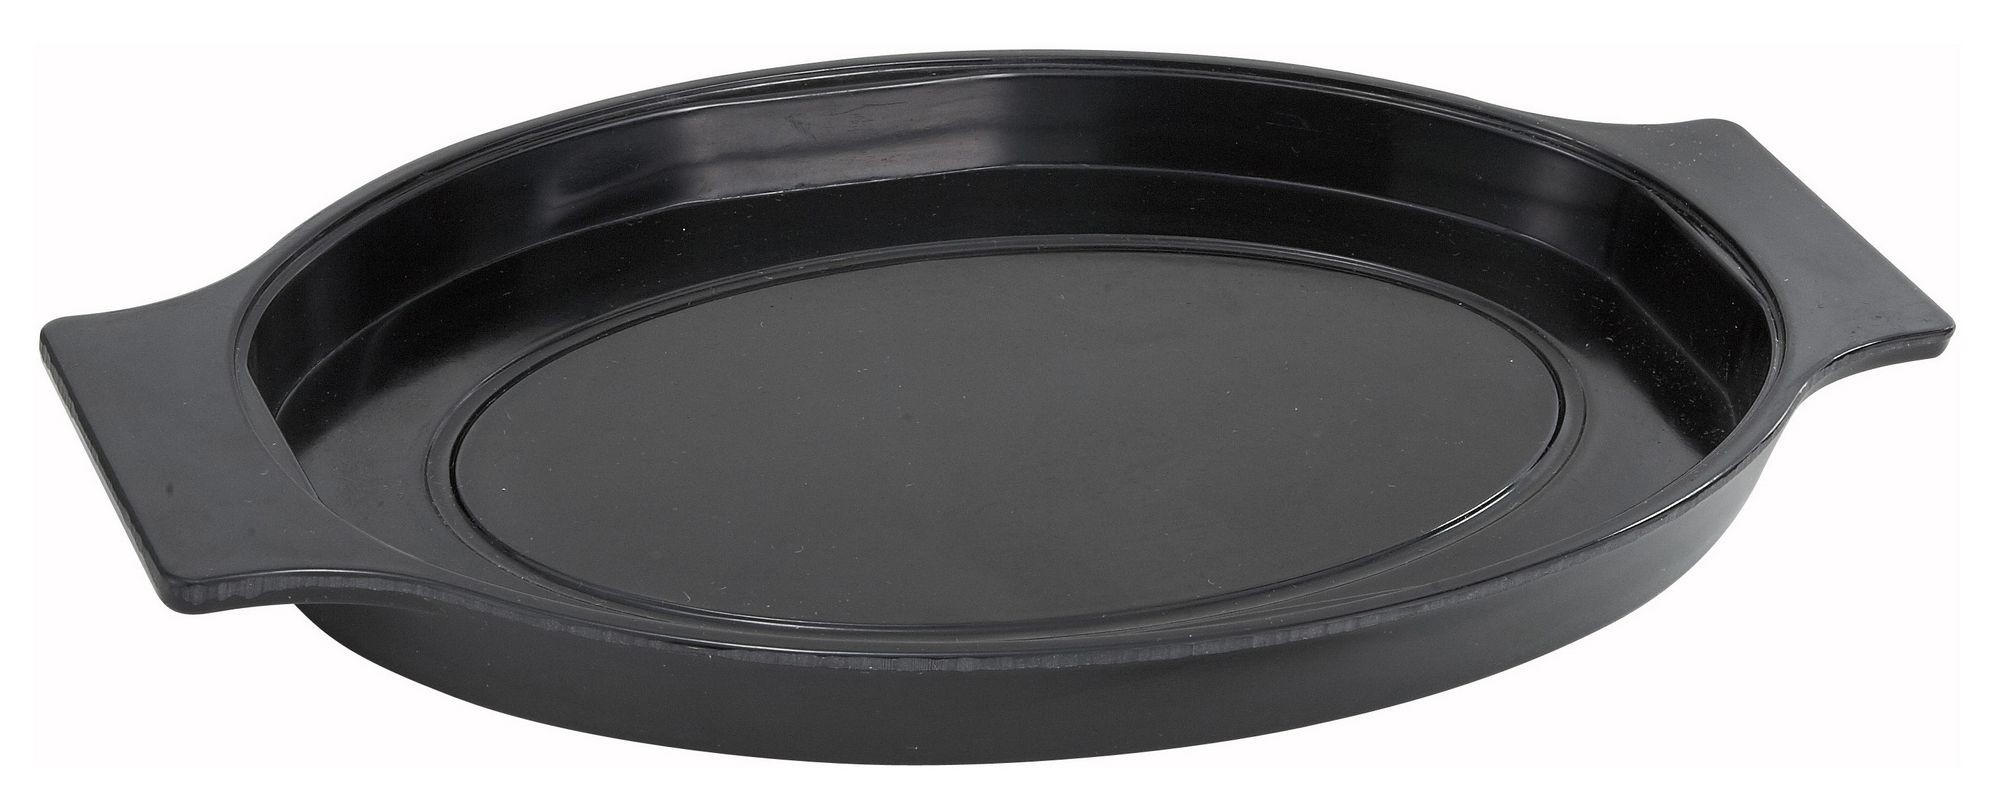 Winco SWU-11 Oval Underliner for Stainless Steel Sizzling Platter